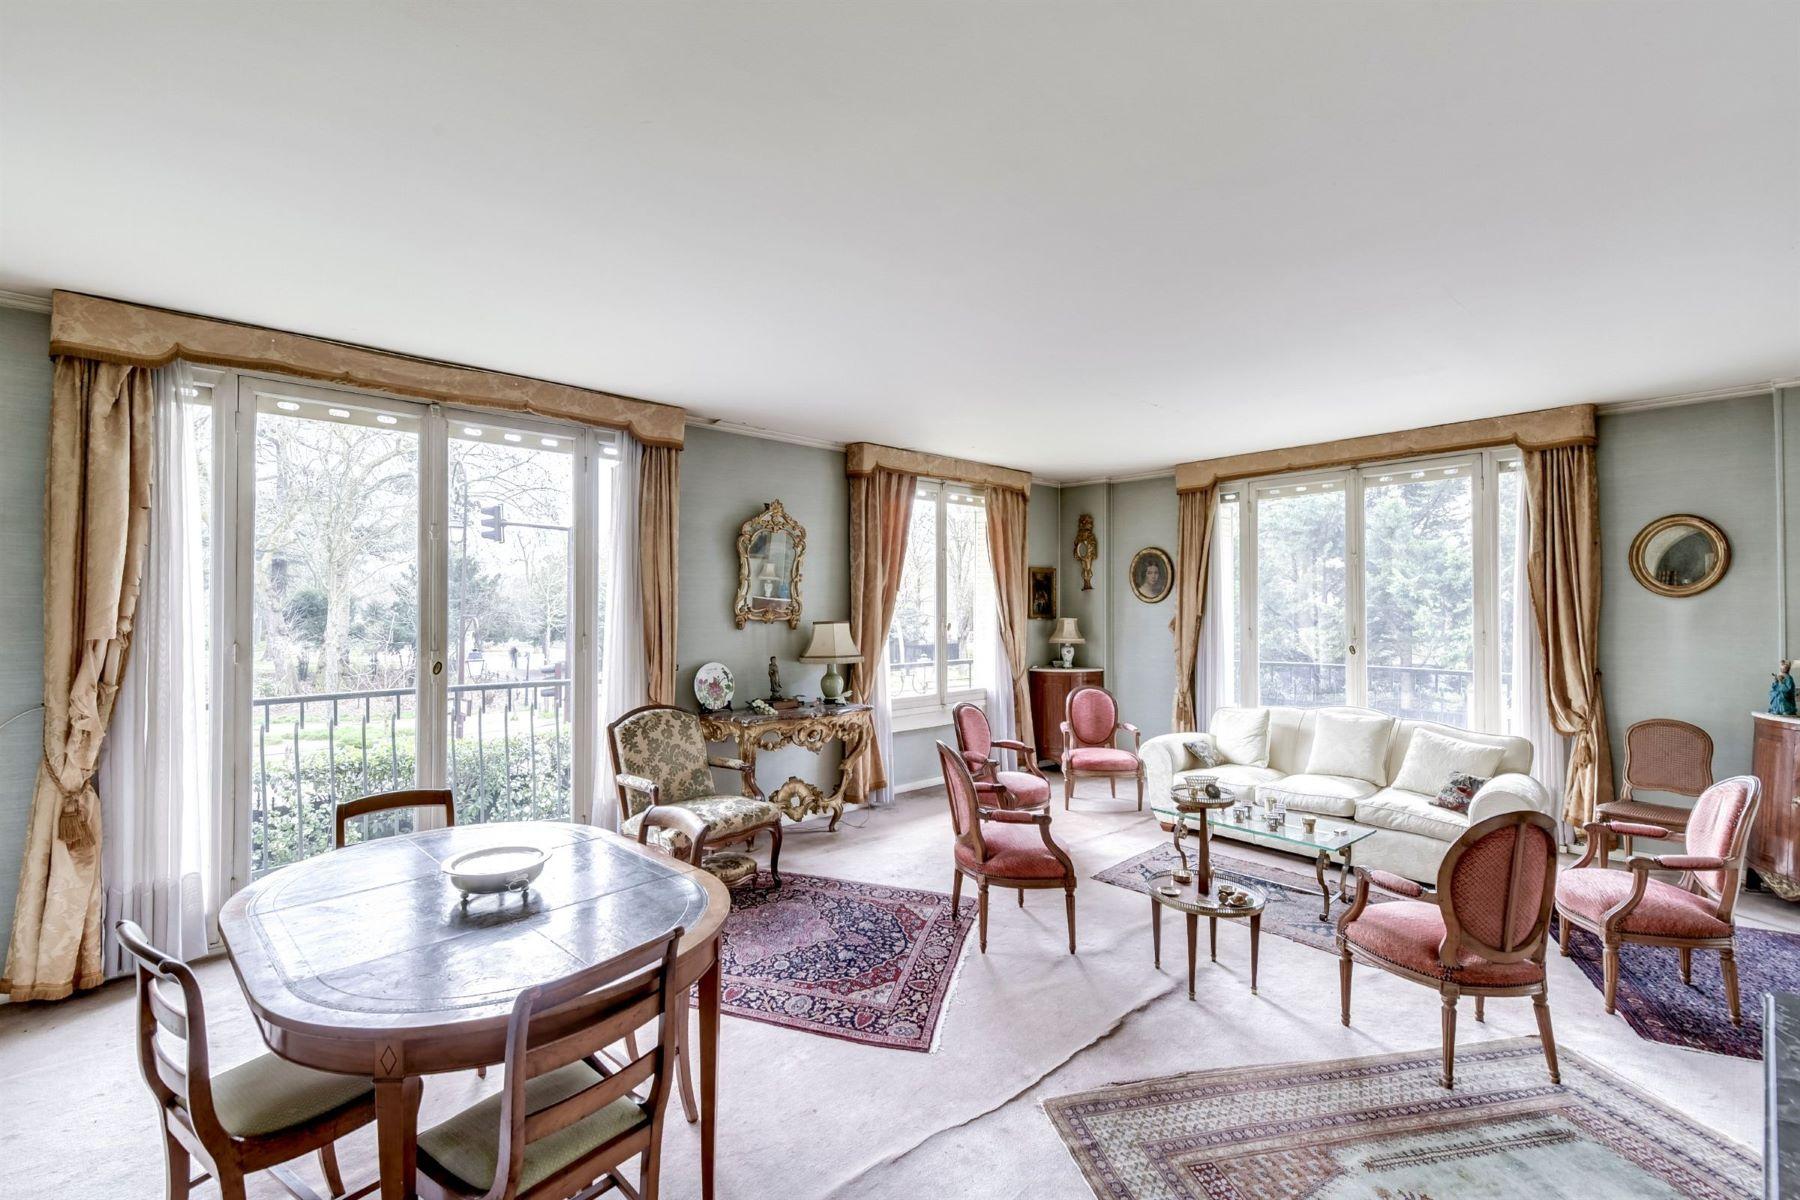 Apartment for Sale at Beautiful 133 sq.m apartment, excellent plan for sale, Neuilly – Bois Neuilly Sur Seine, Ile-De-France, 92200 France